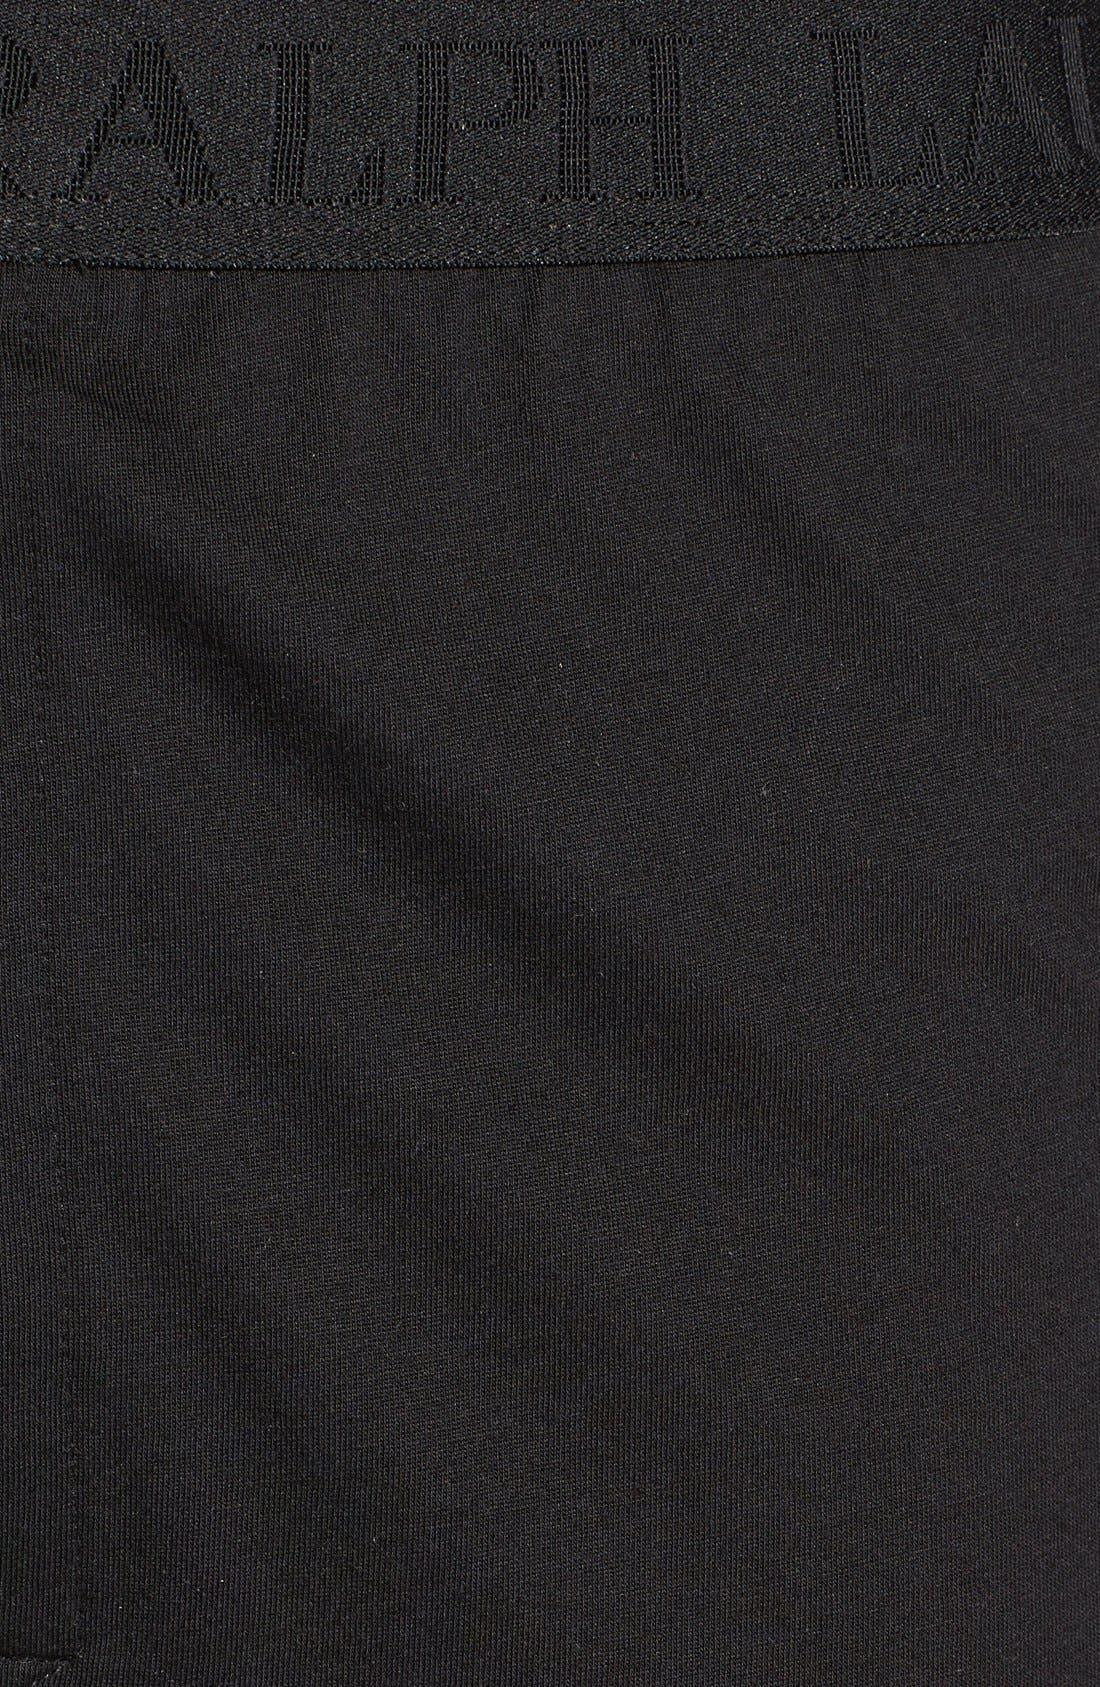 Supreme Comfort 2-Pack Boxers,                             Alternate thumbnail 3, color,                             Polo Black